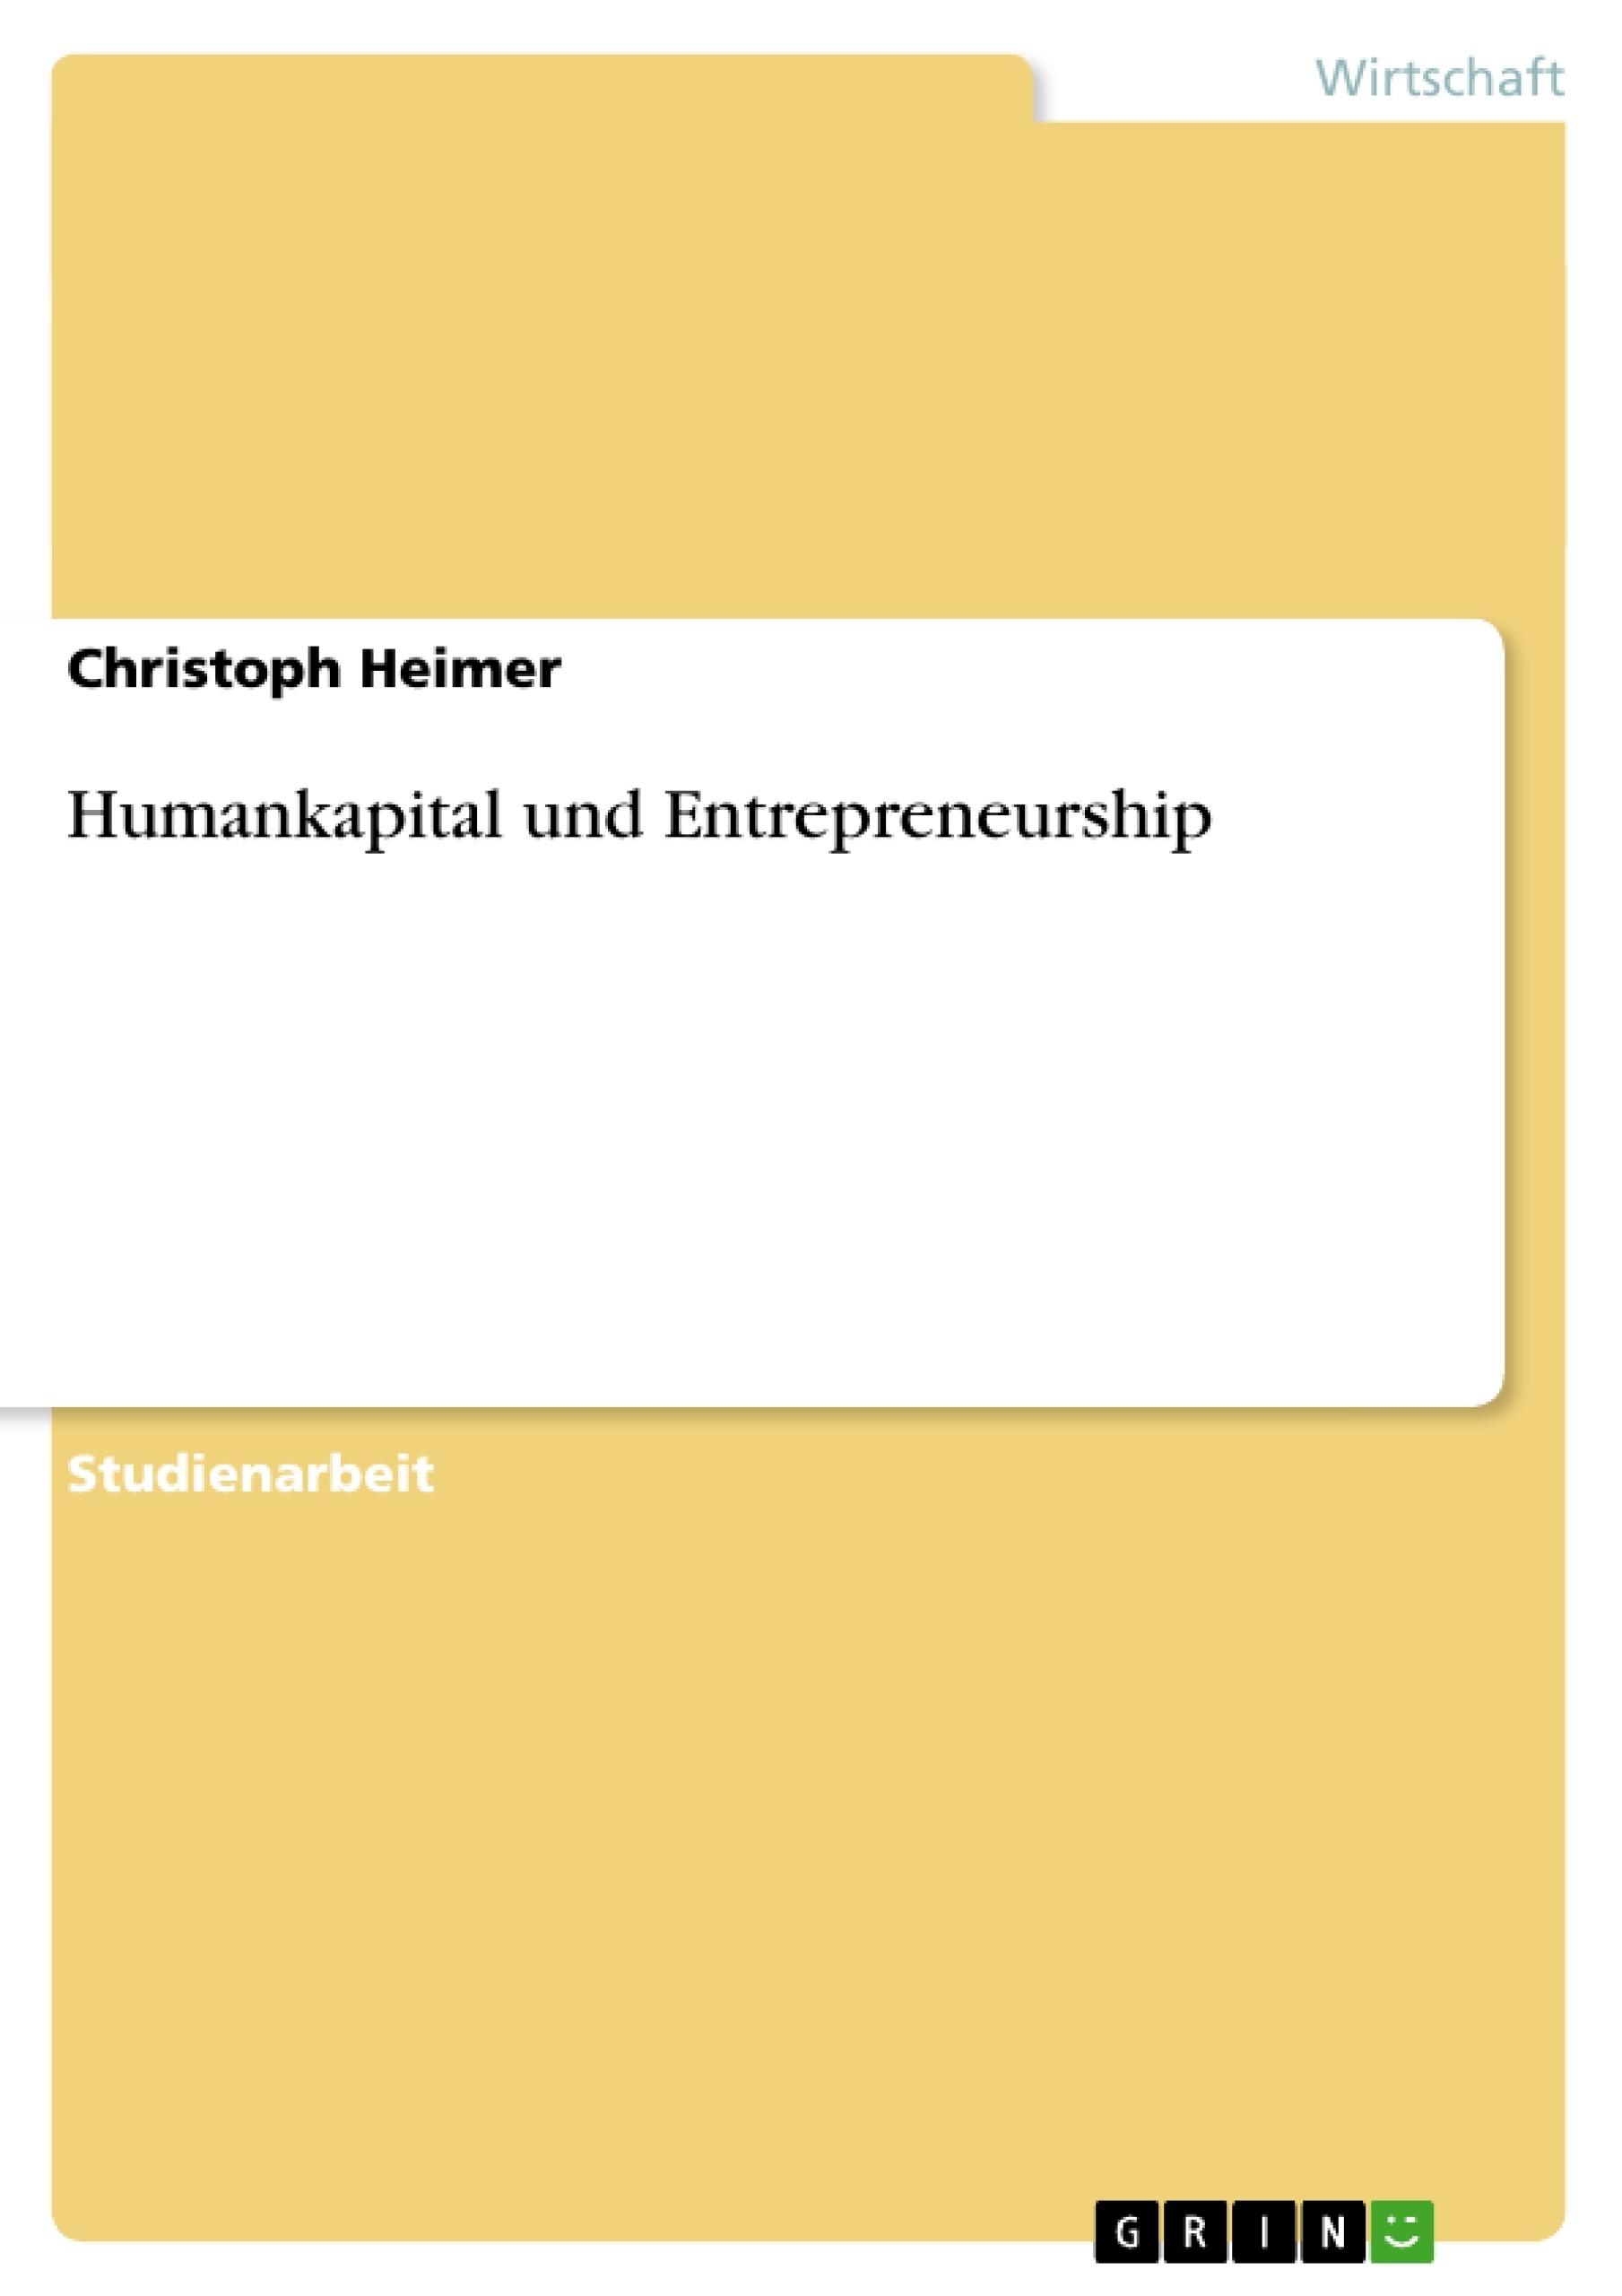 Titel: Humankapital und Entrepreneurship